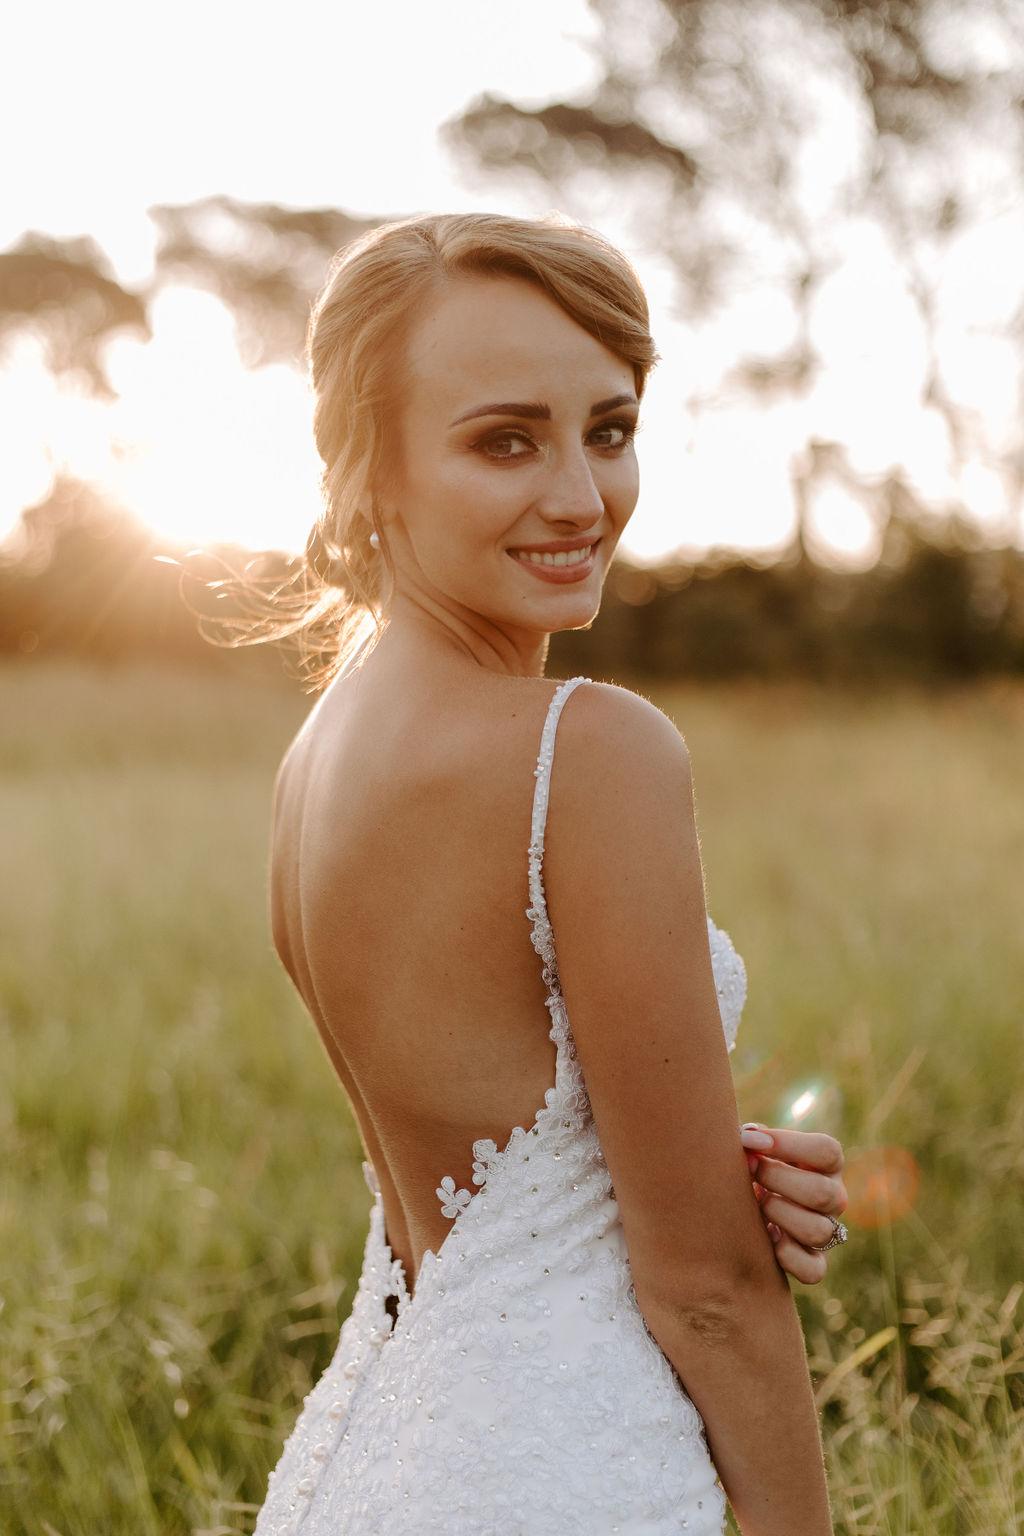 Leona's Wedding